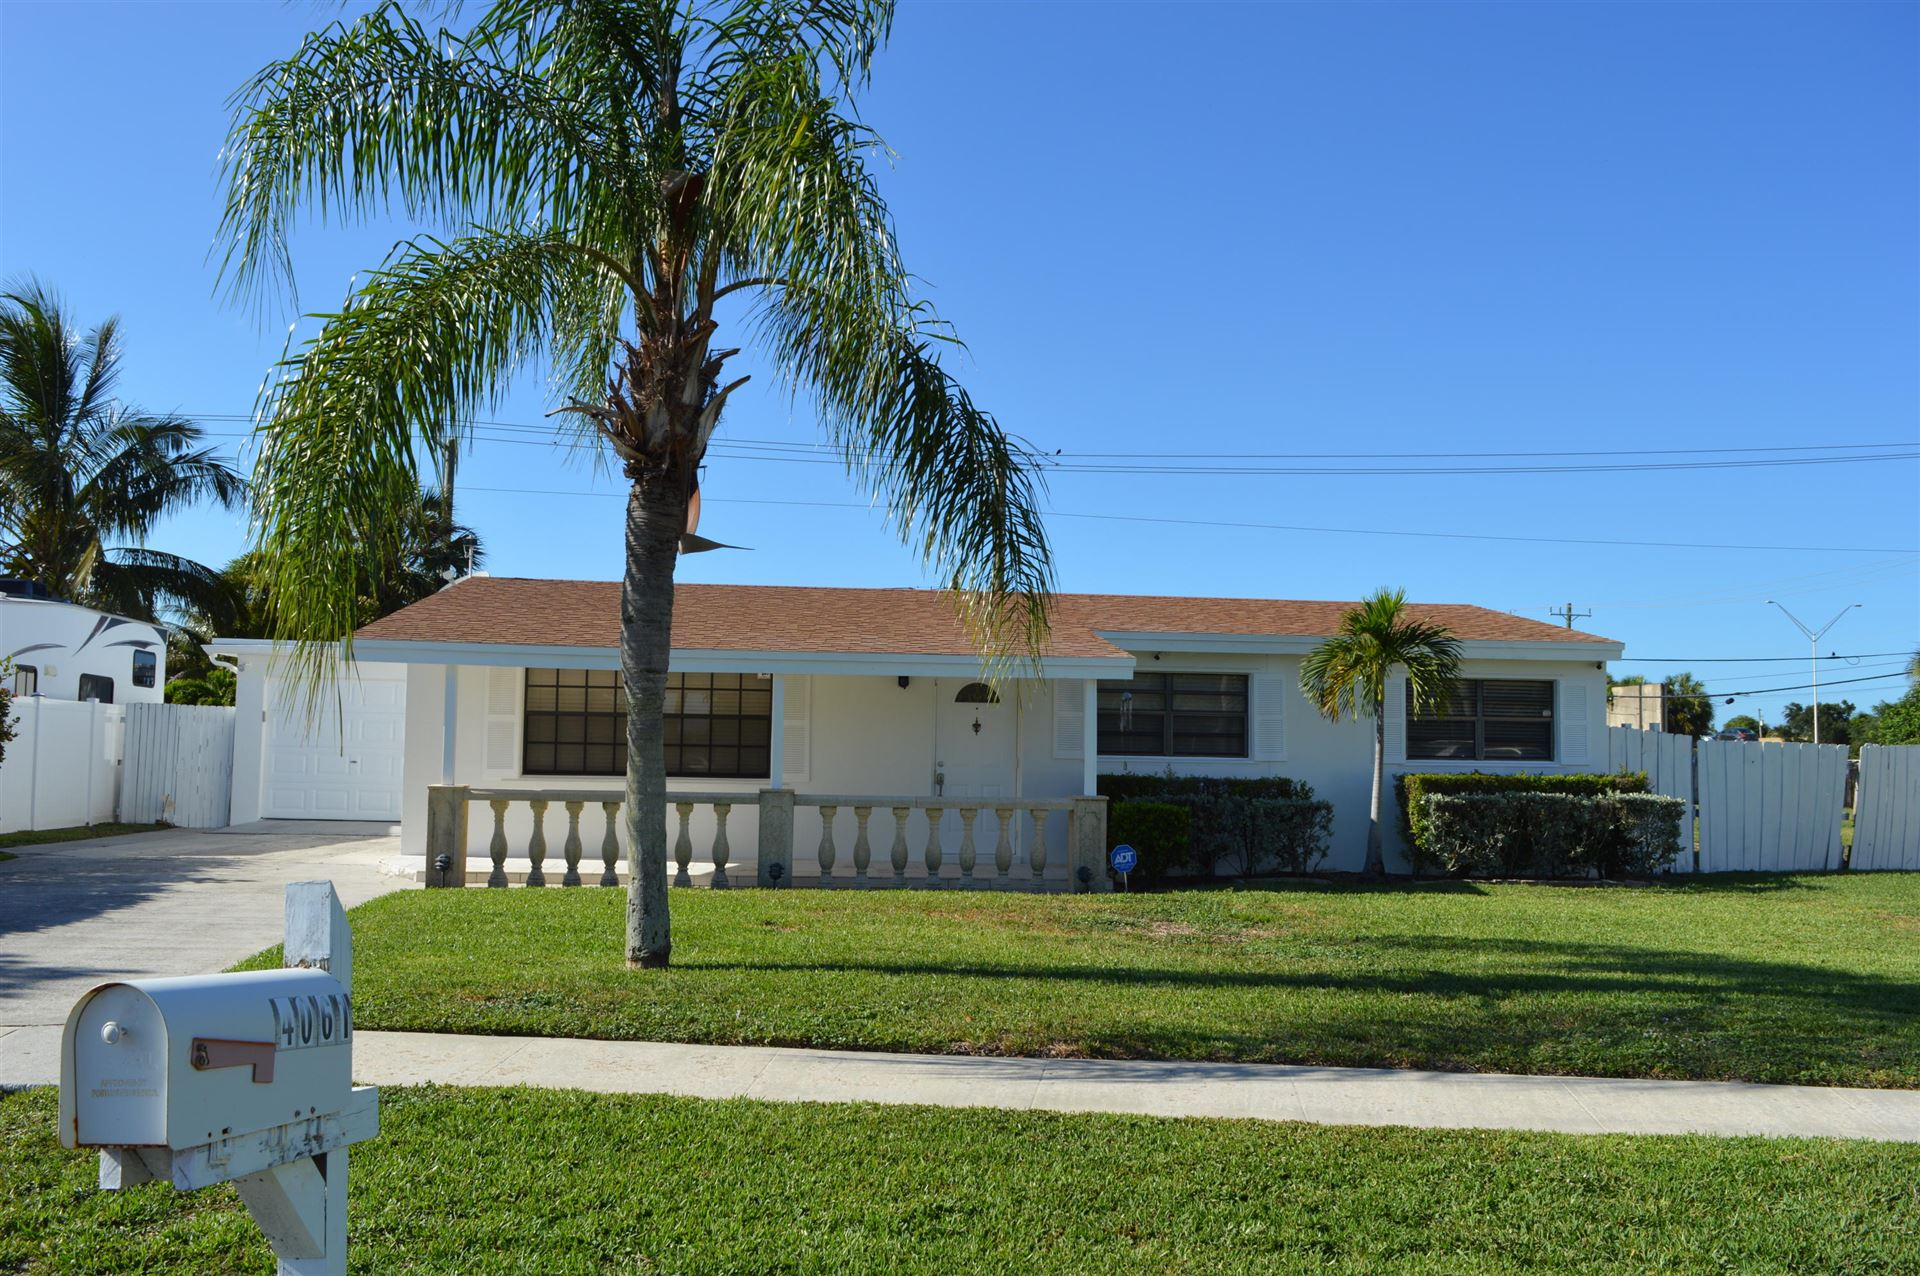 Photo of 4061 Rodgers Street, Palm Beach Gardens, FL 33410 (MLS # RX-10725803)